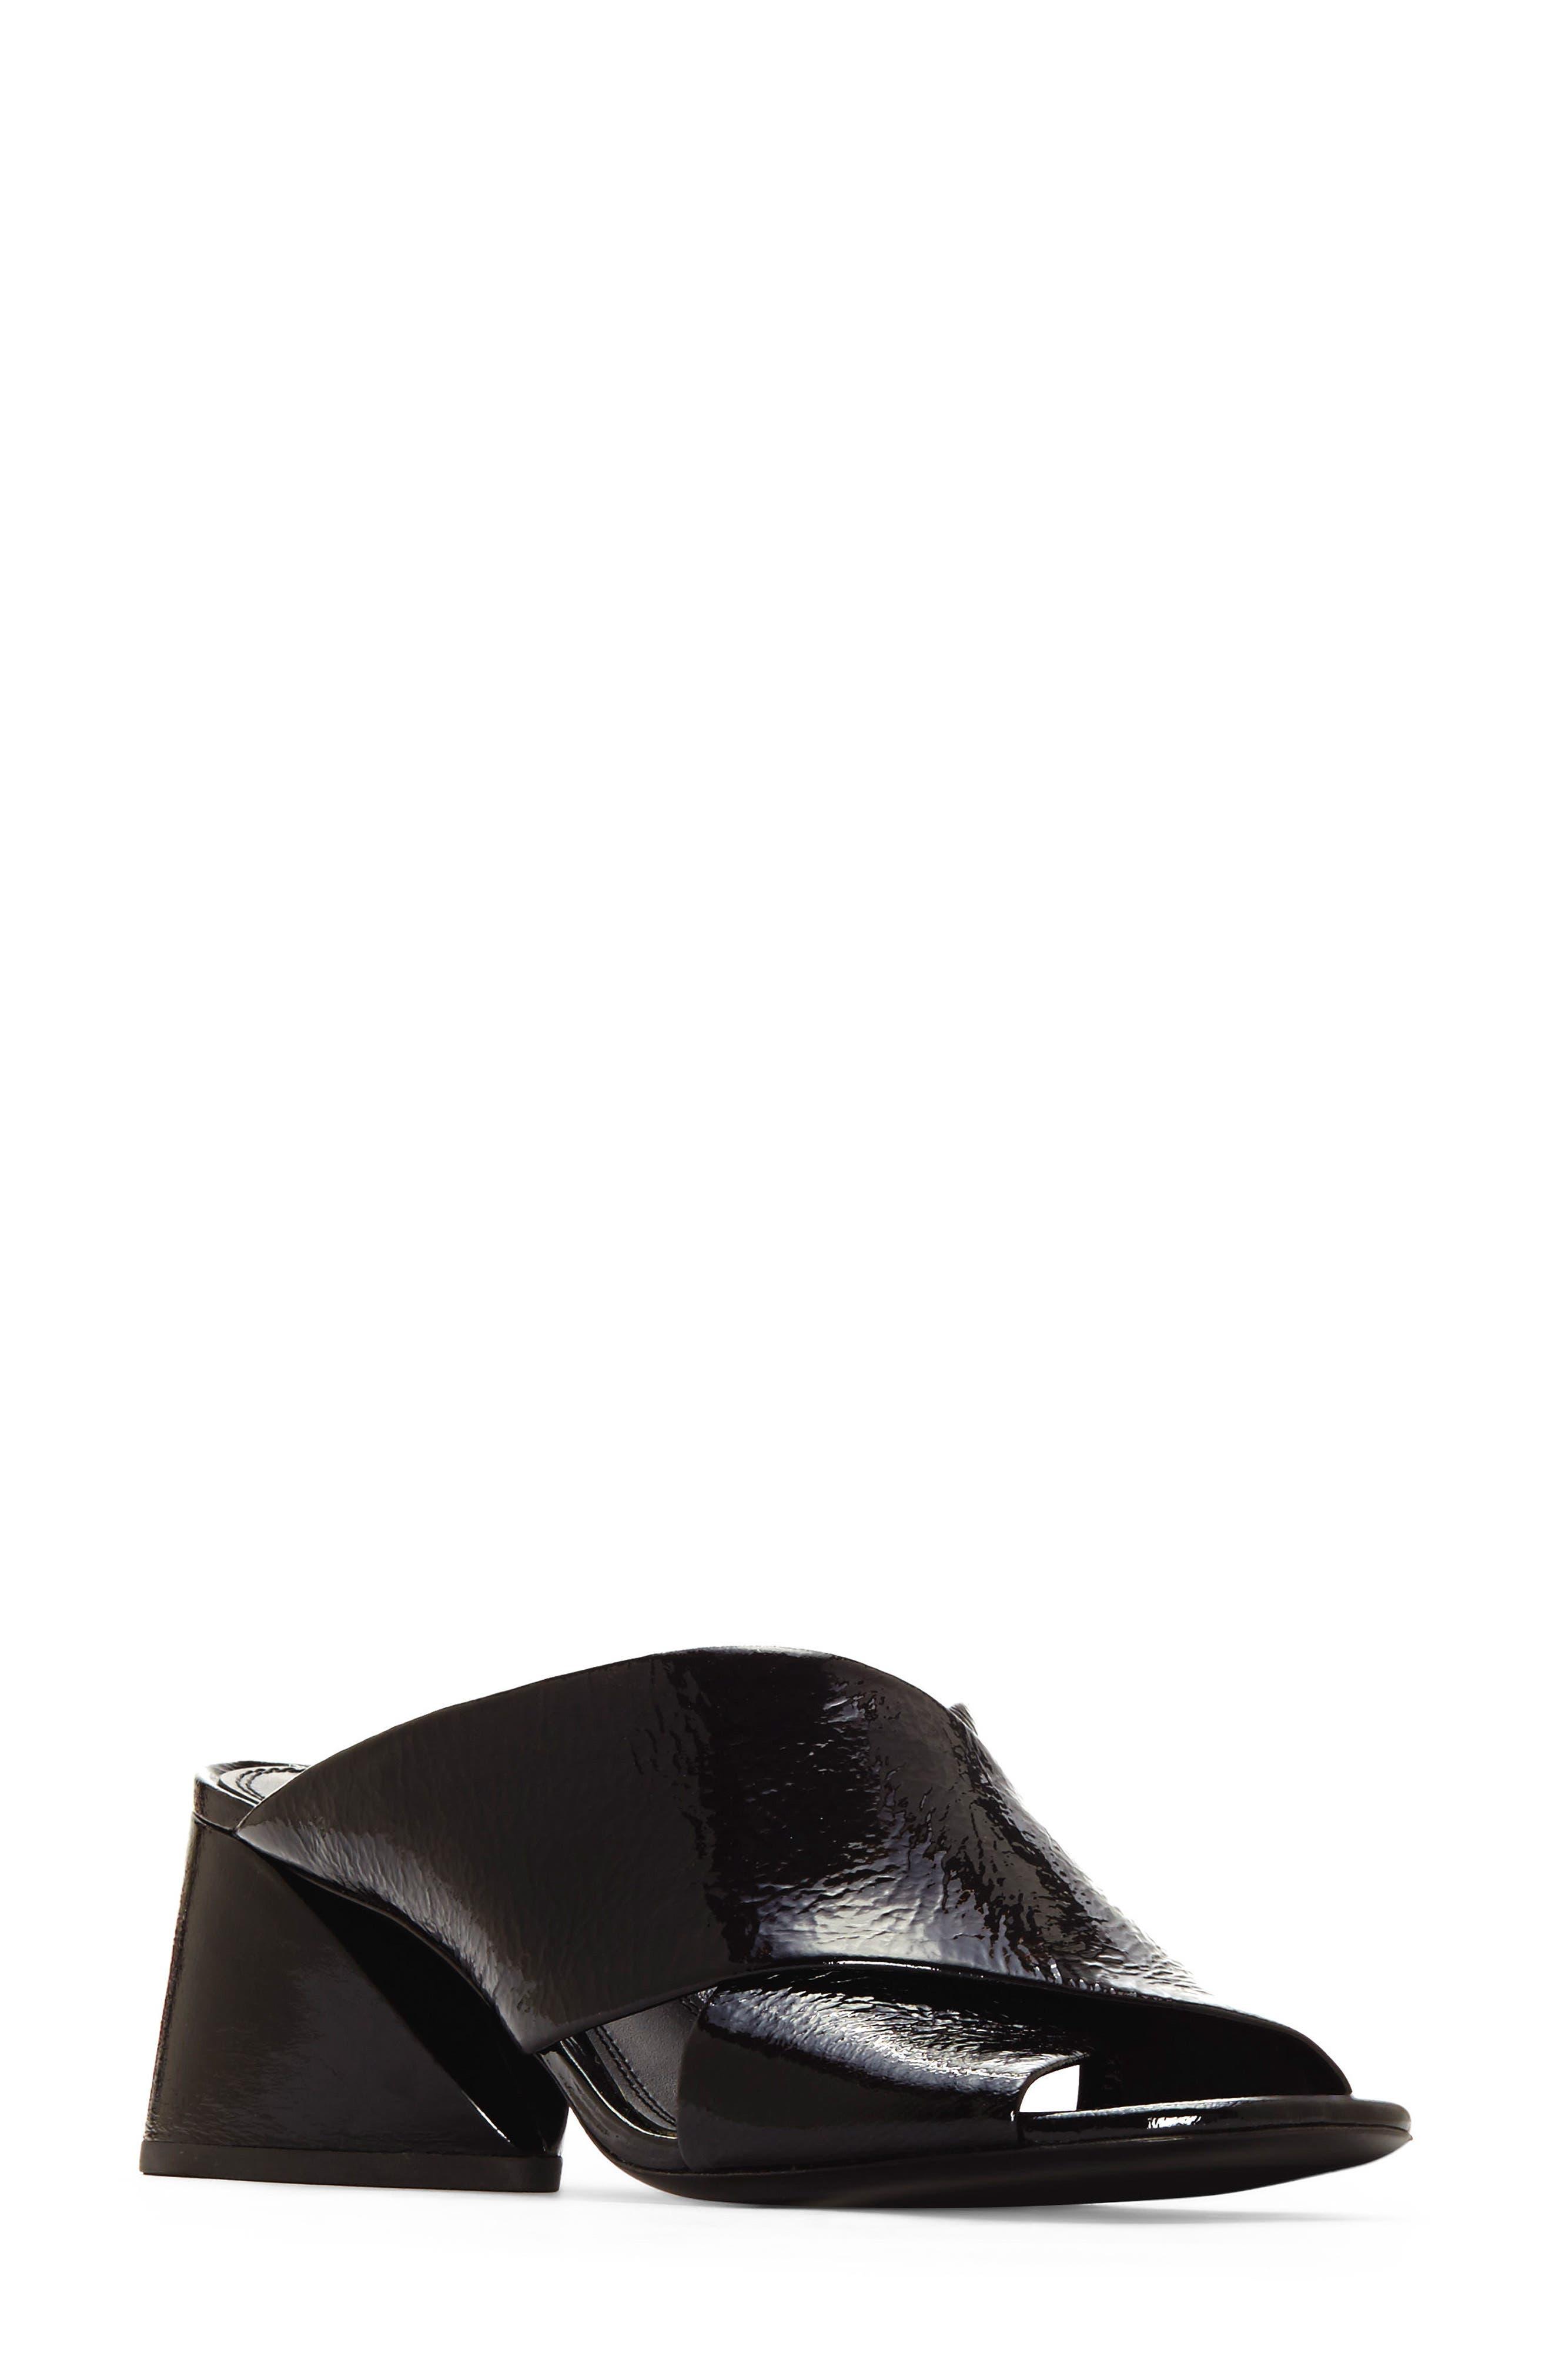 Lenilow Cross Strap Sandal,                         Main,                         color, 001